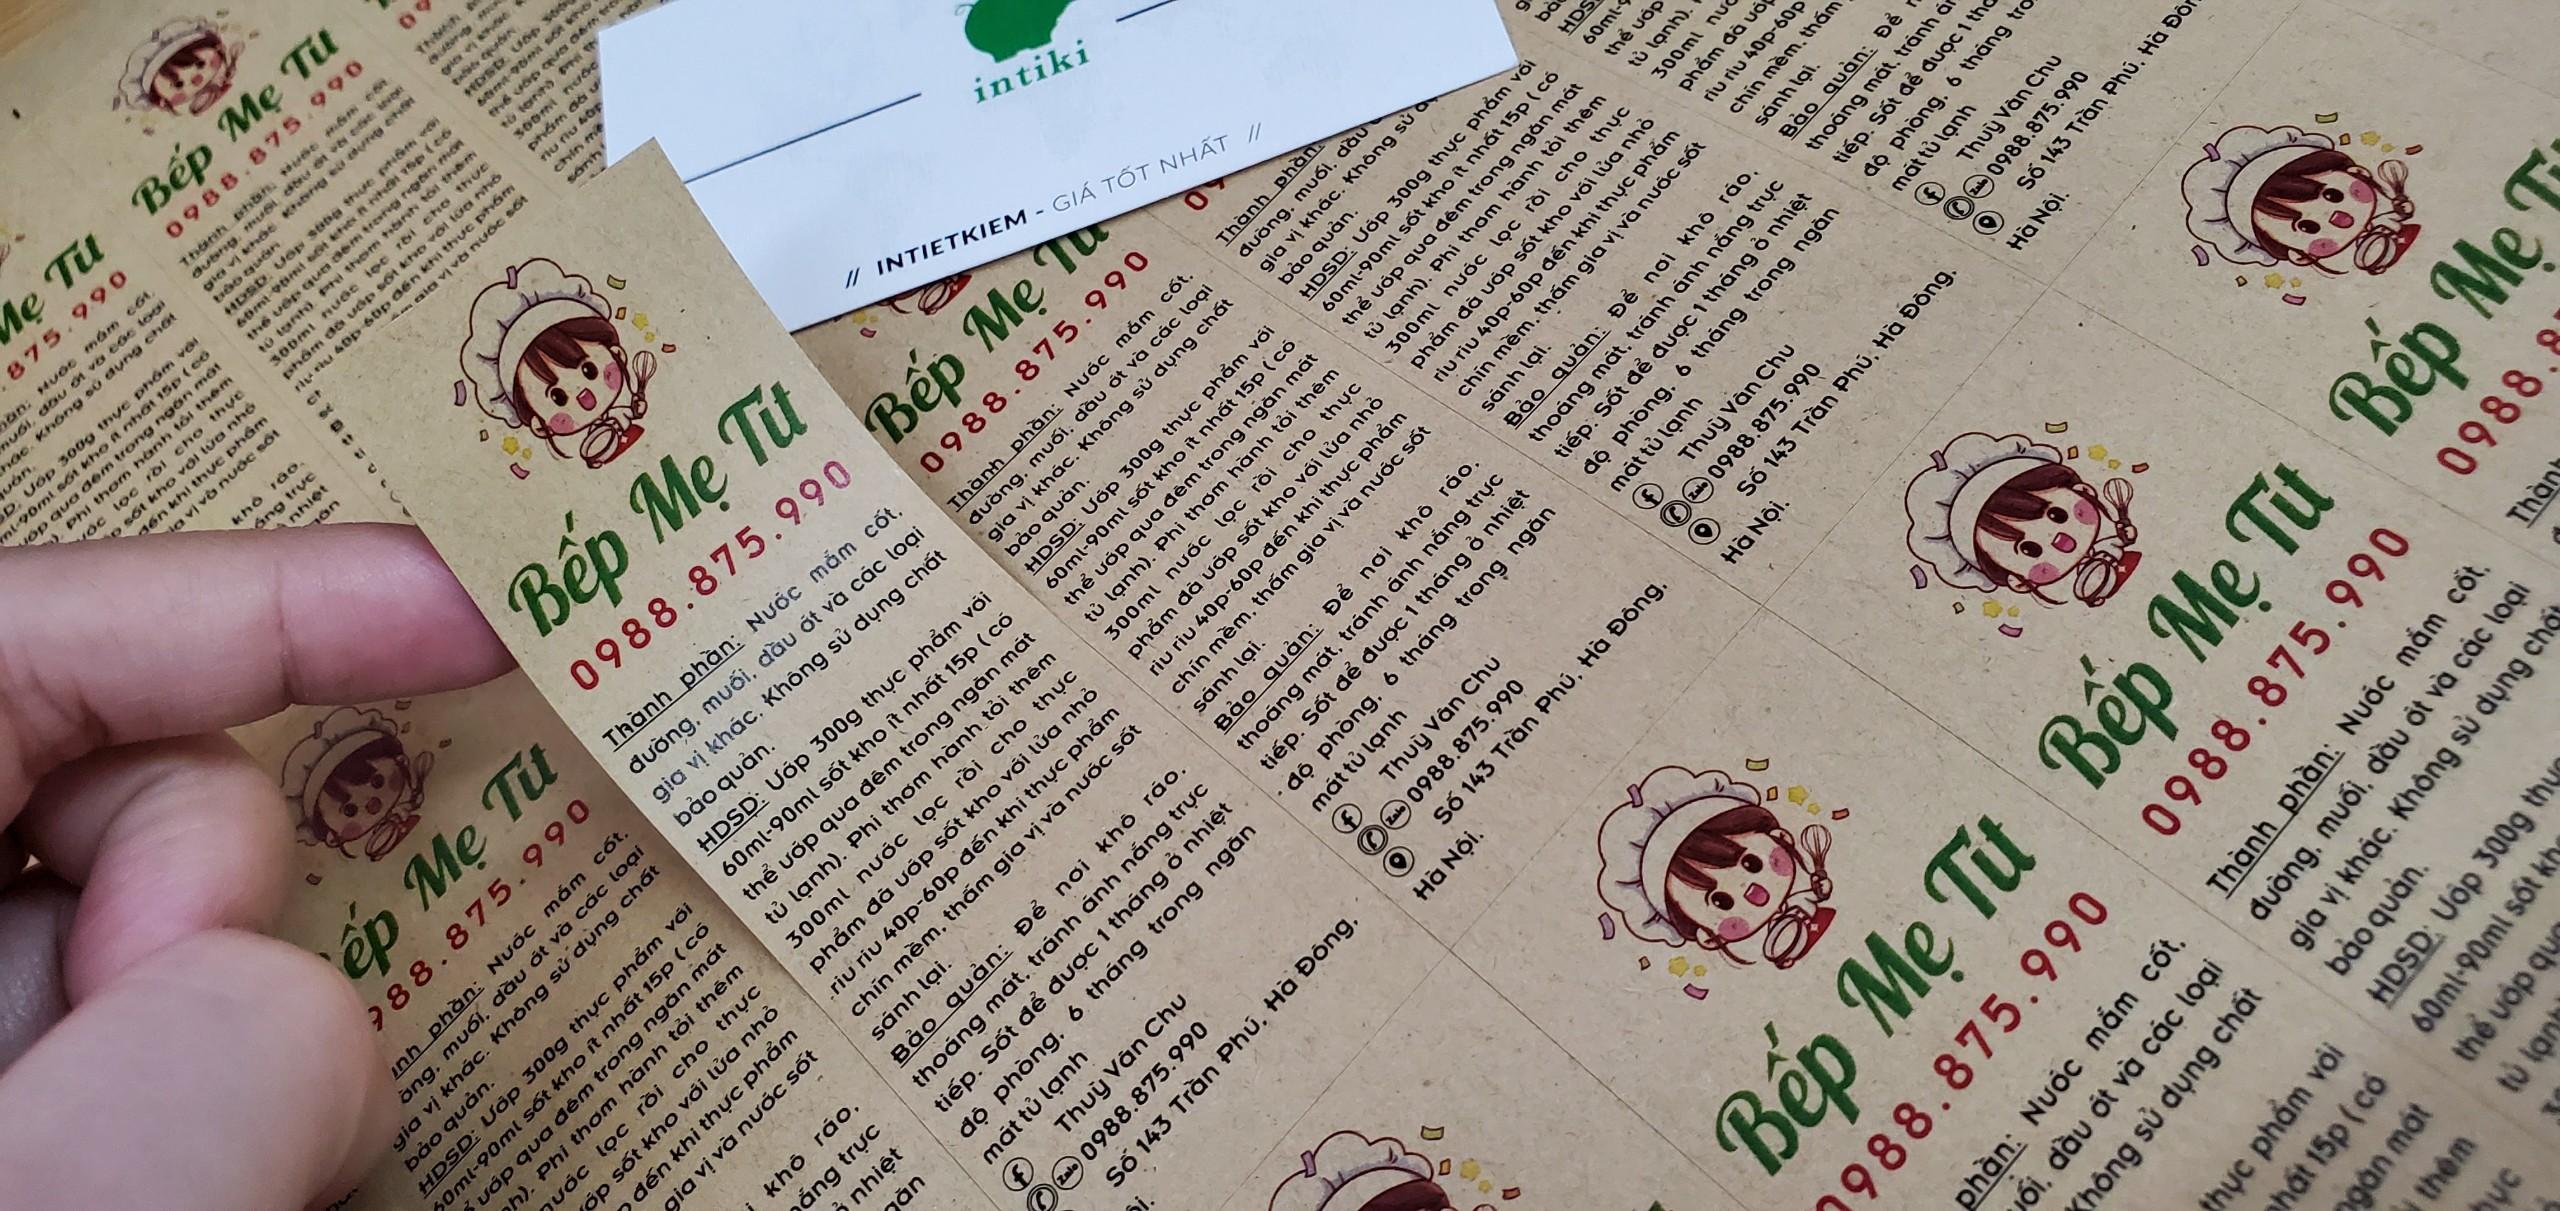 in decal giấy tại Hà Nội